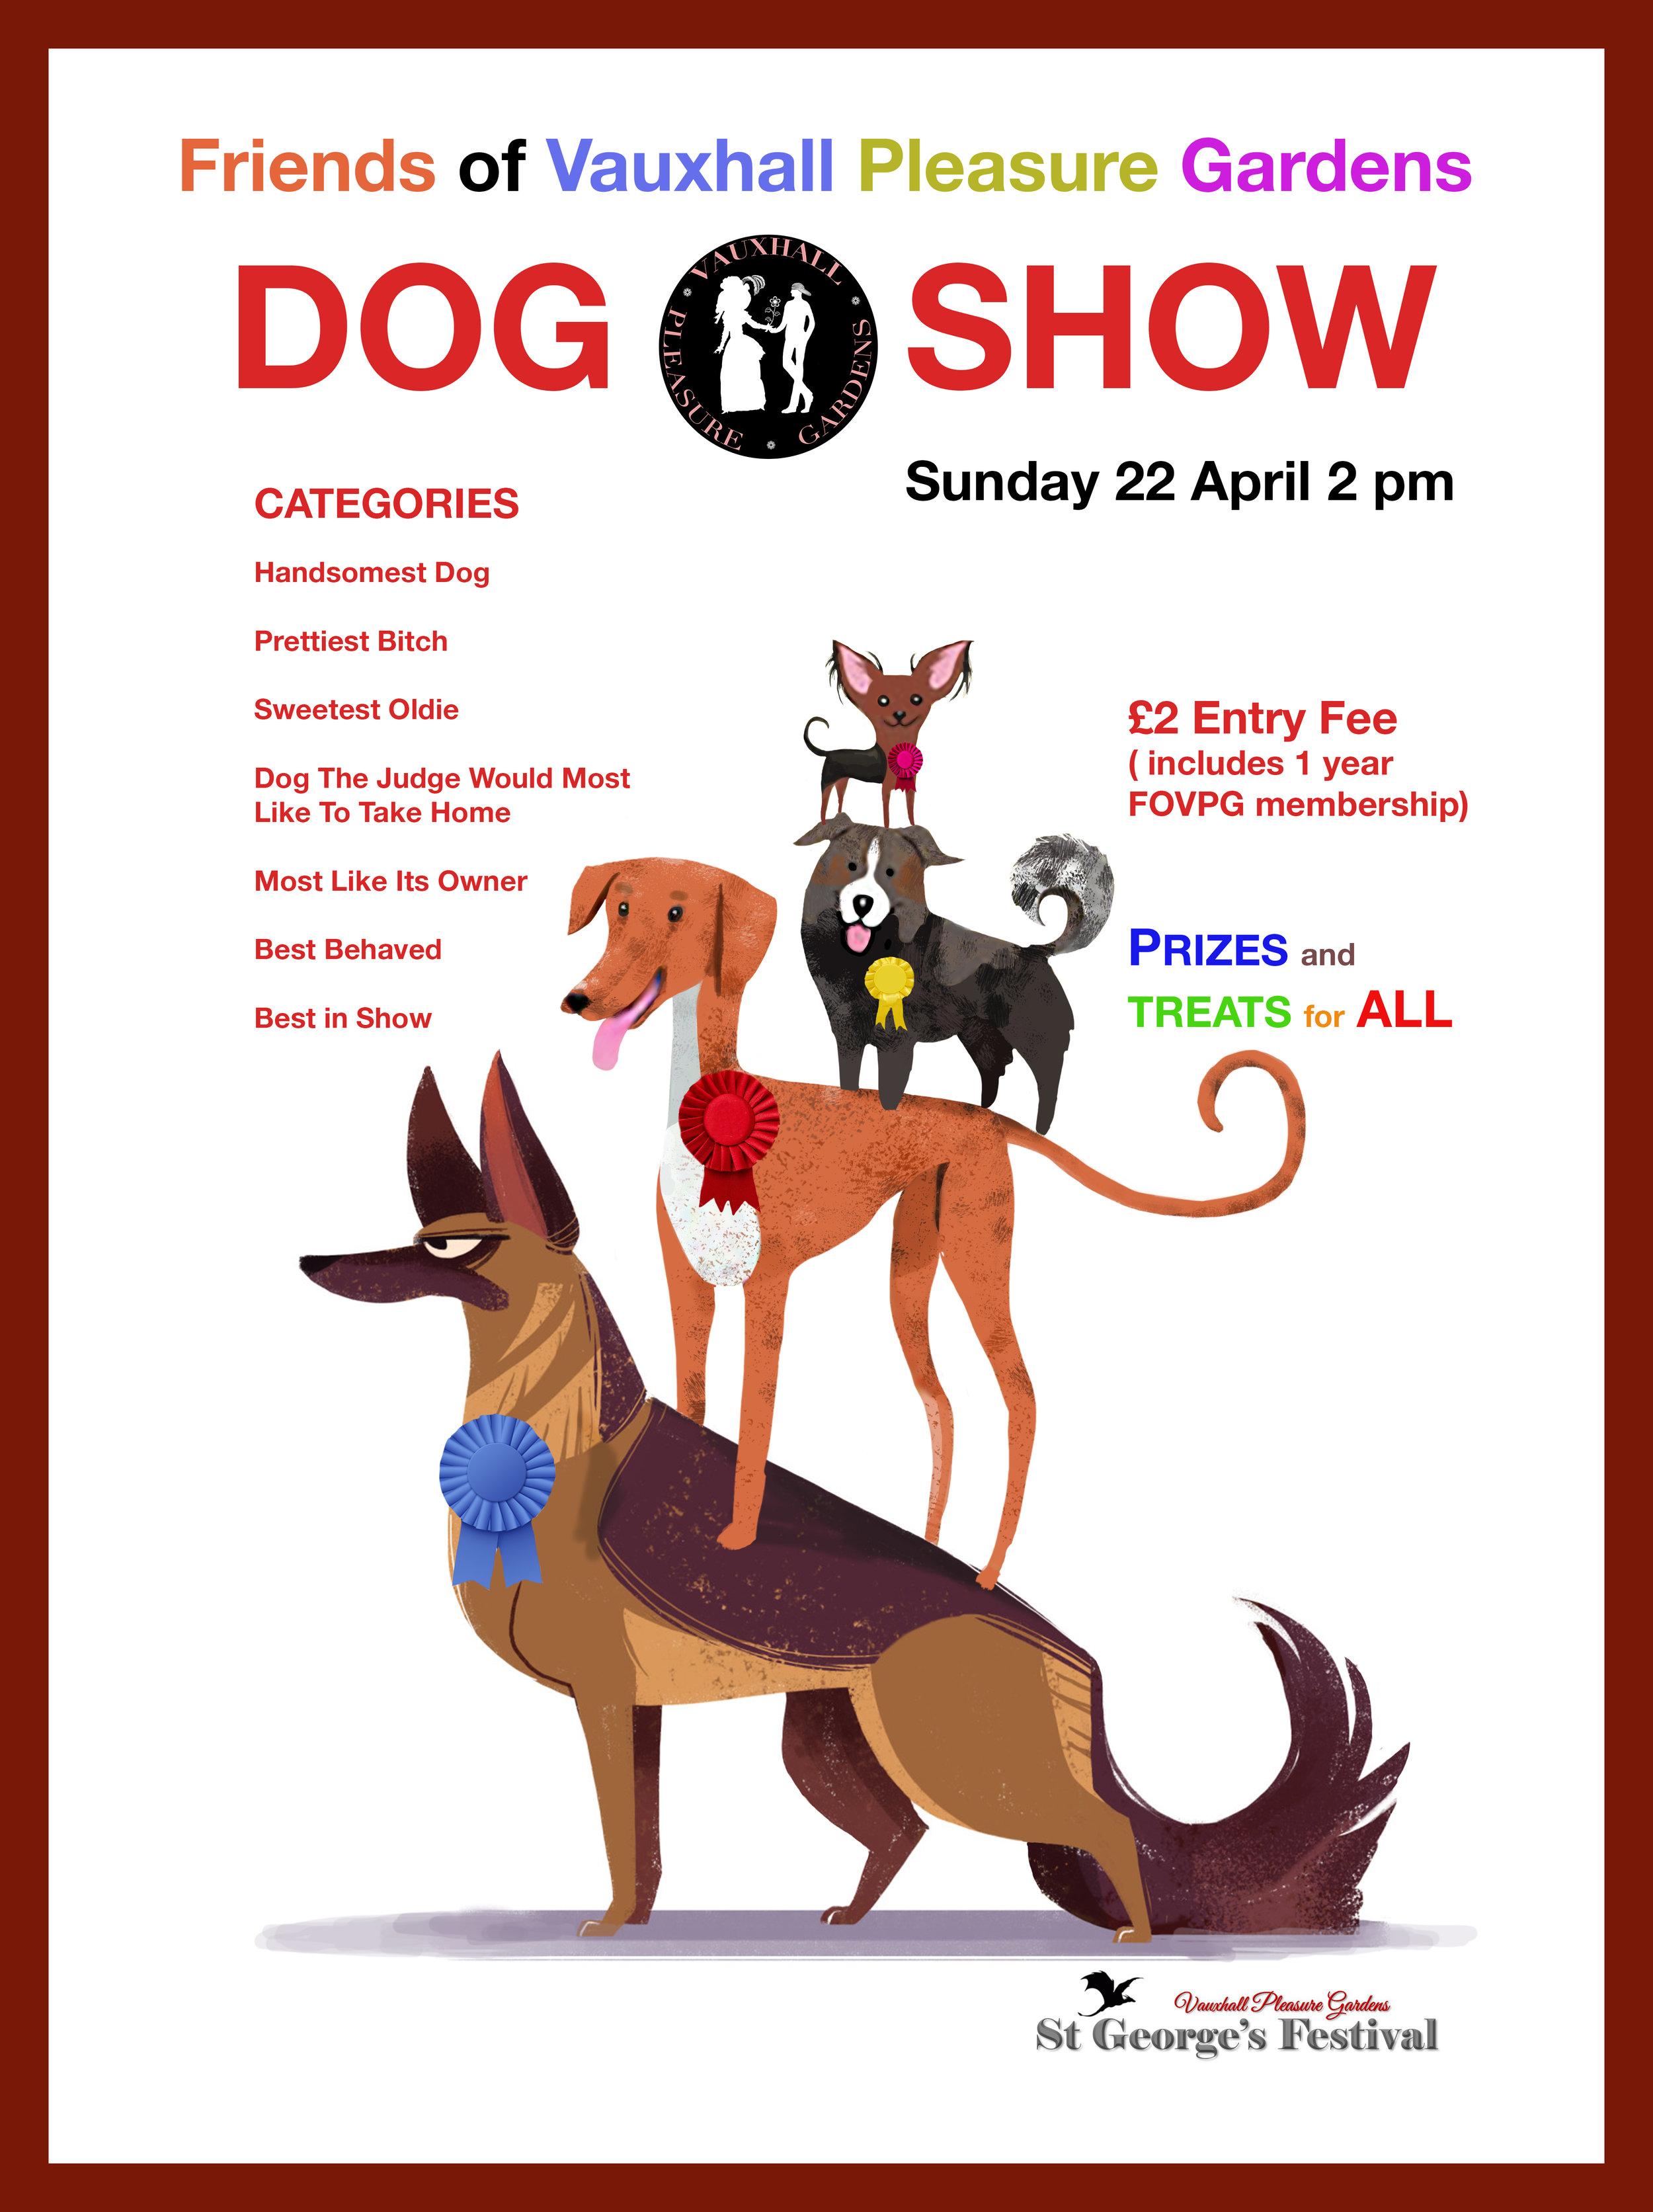 FOVPG dog show 2018.jpg